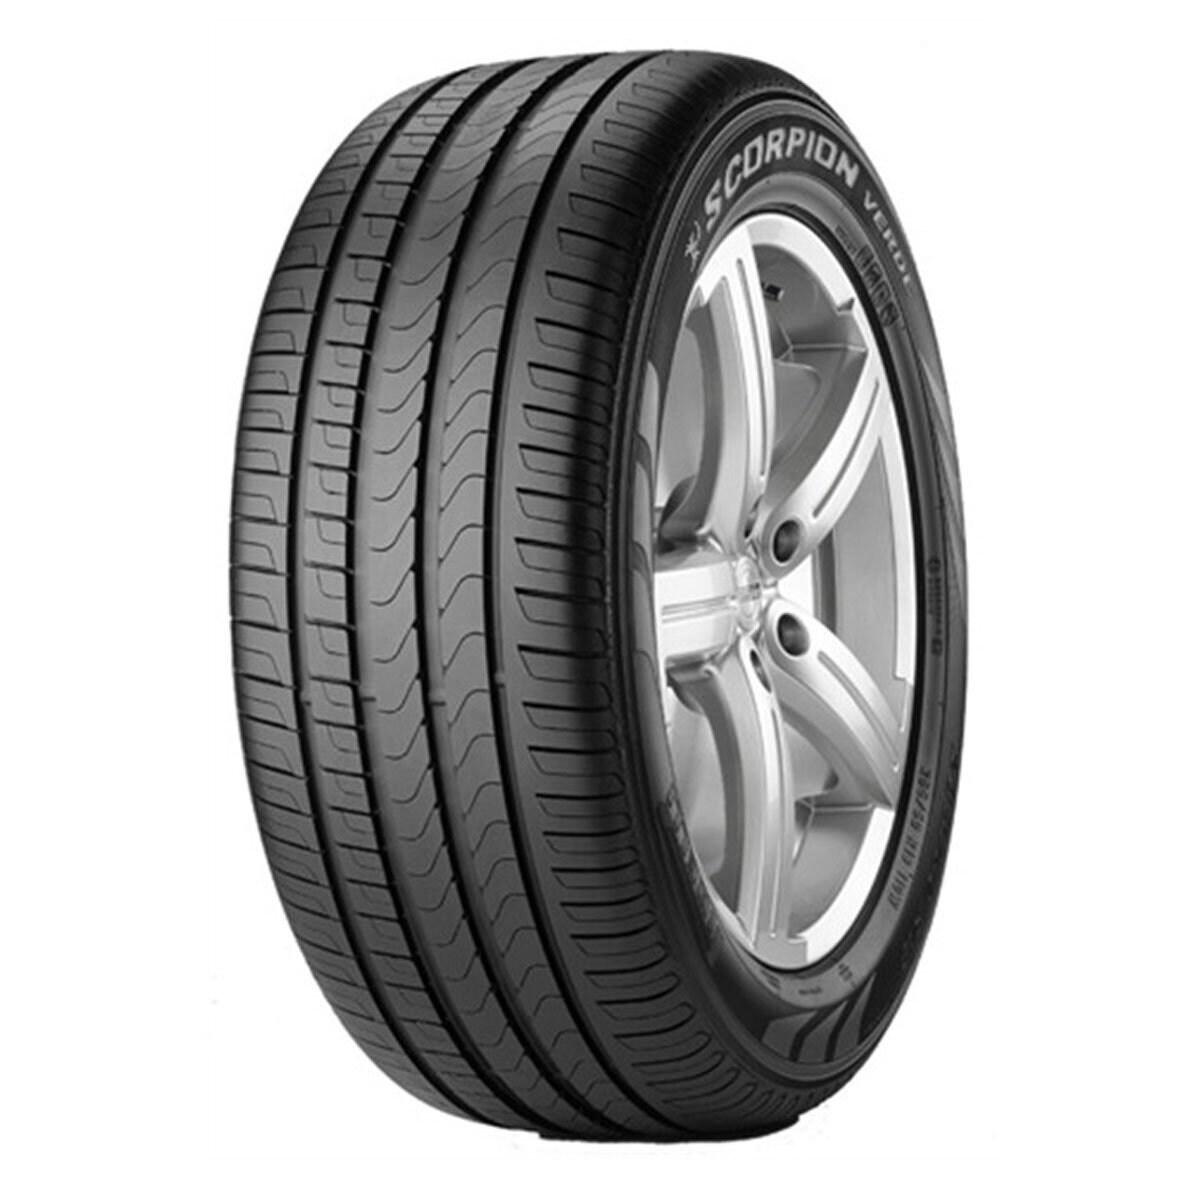 Spllanta 255 50 R19 Sc Verde 107H 2447400 Pirelli